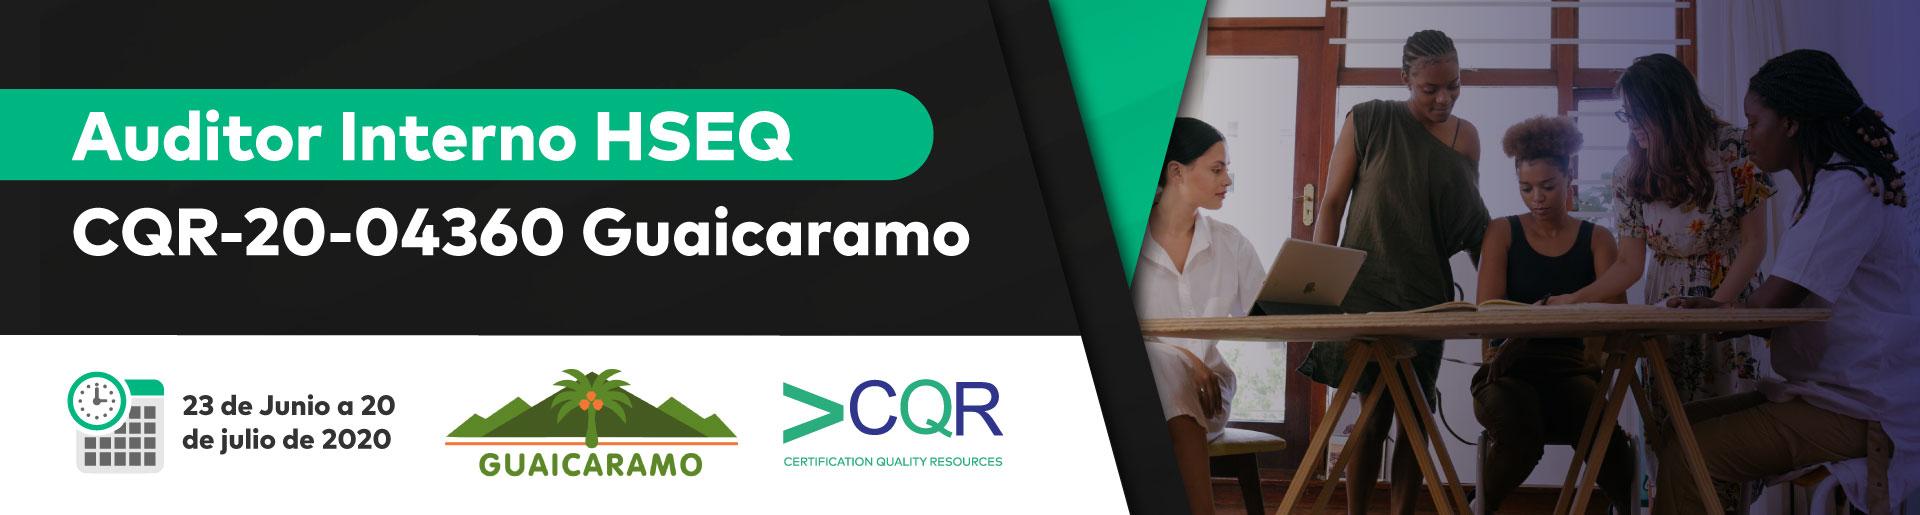 Auditor Interno HSEQ Guaicaramo